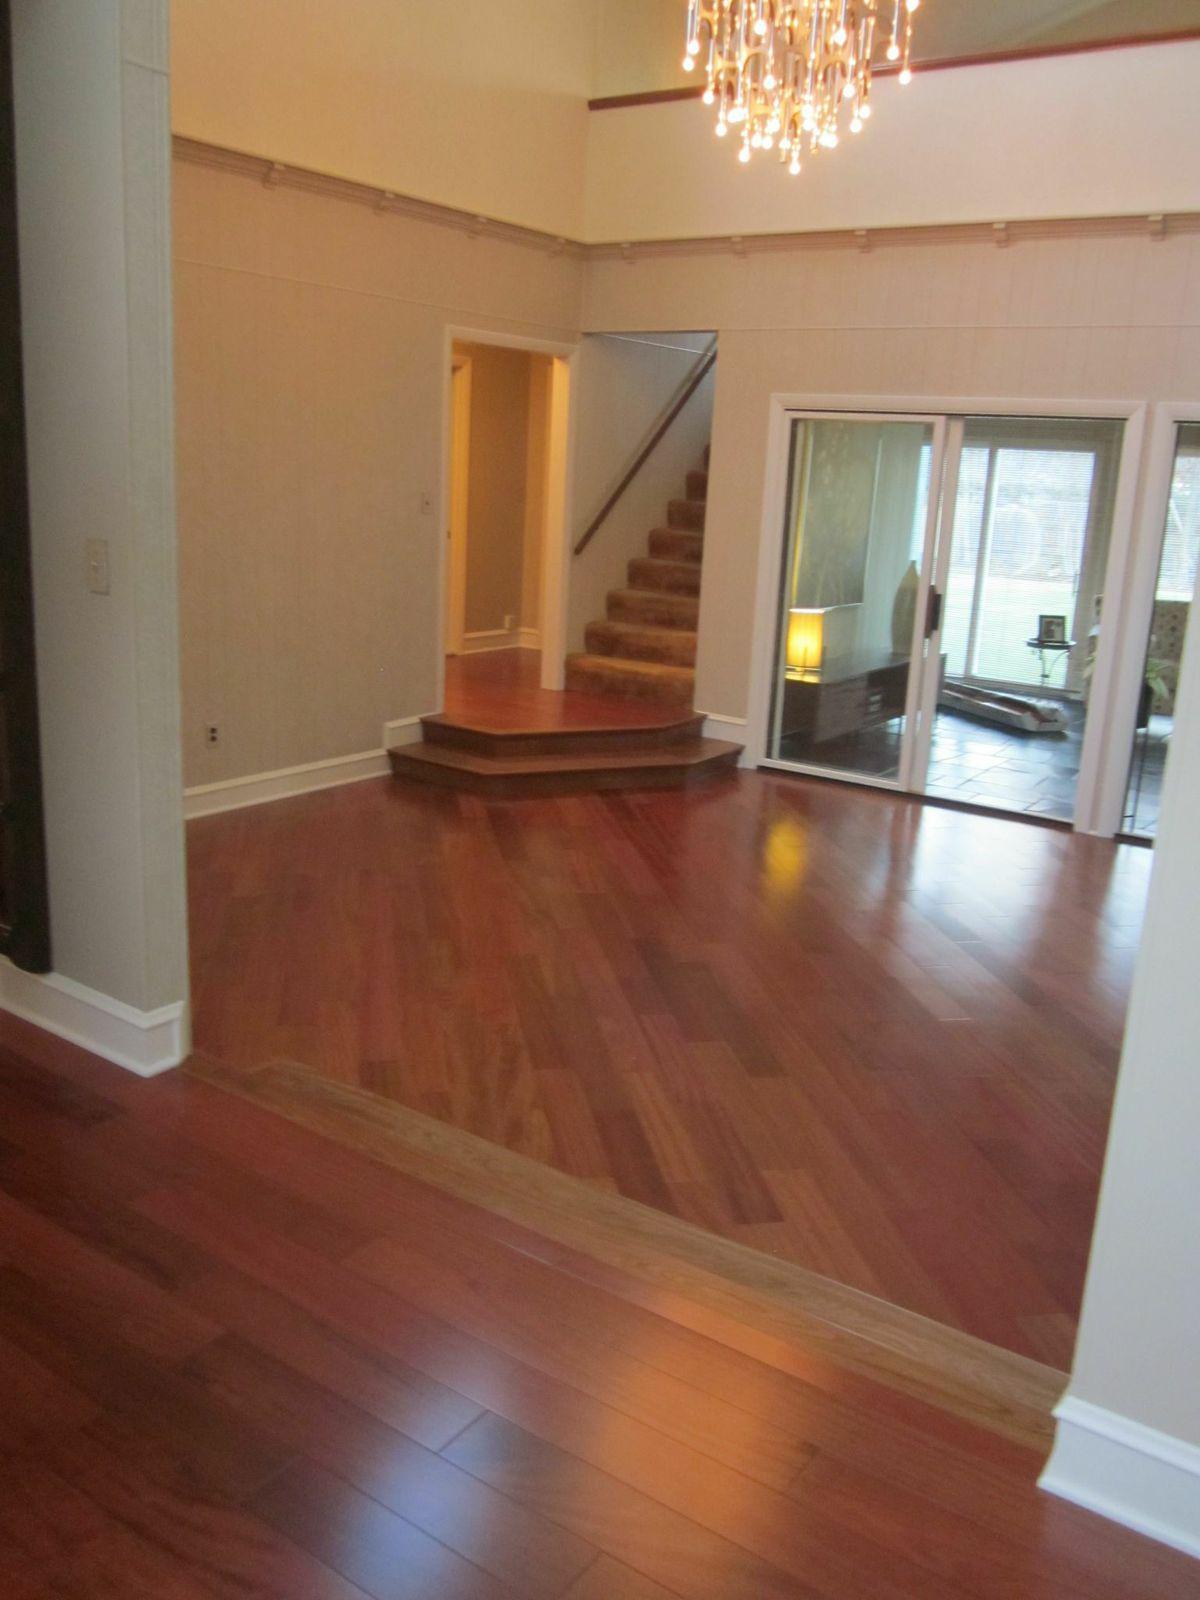 Regal flooring options